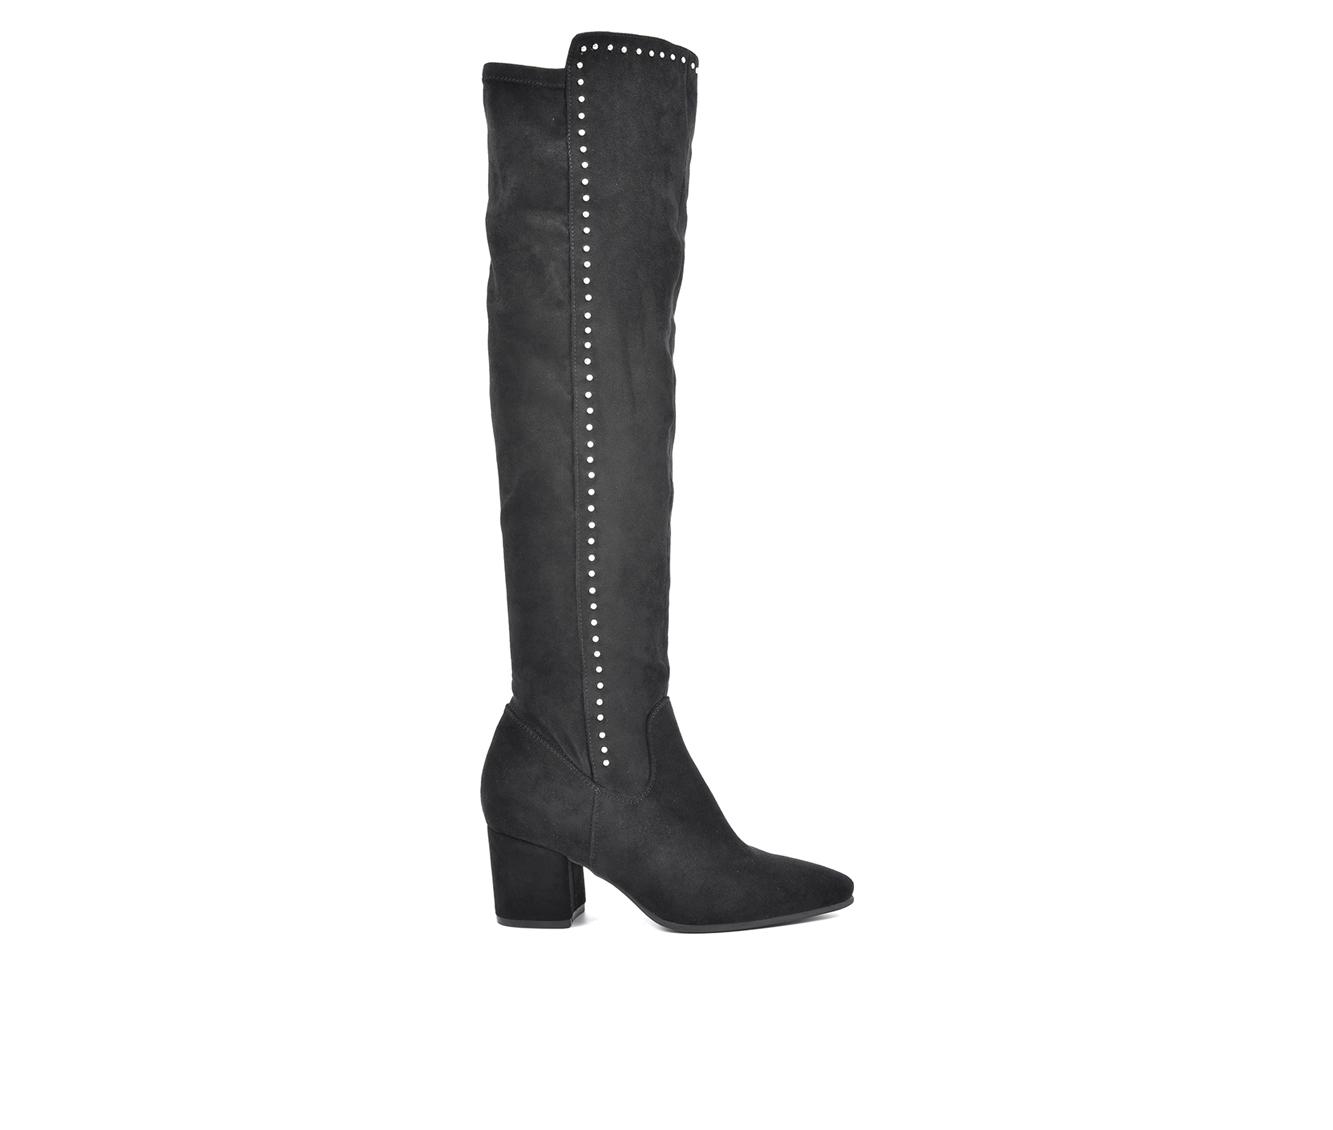 Seven Dials Nessie Women's Boot (Black Faux Leather)